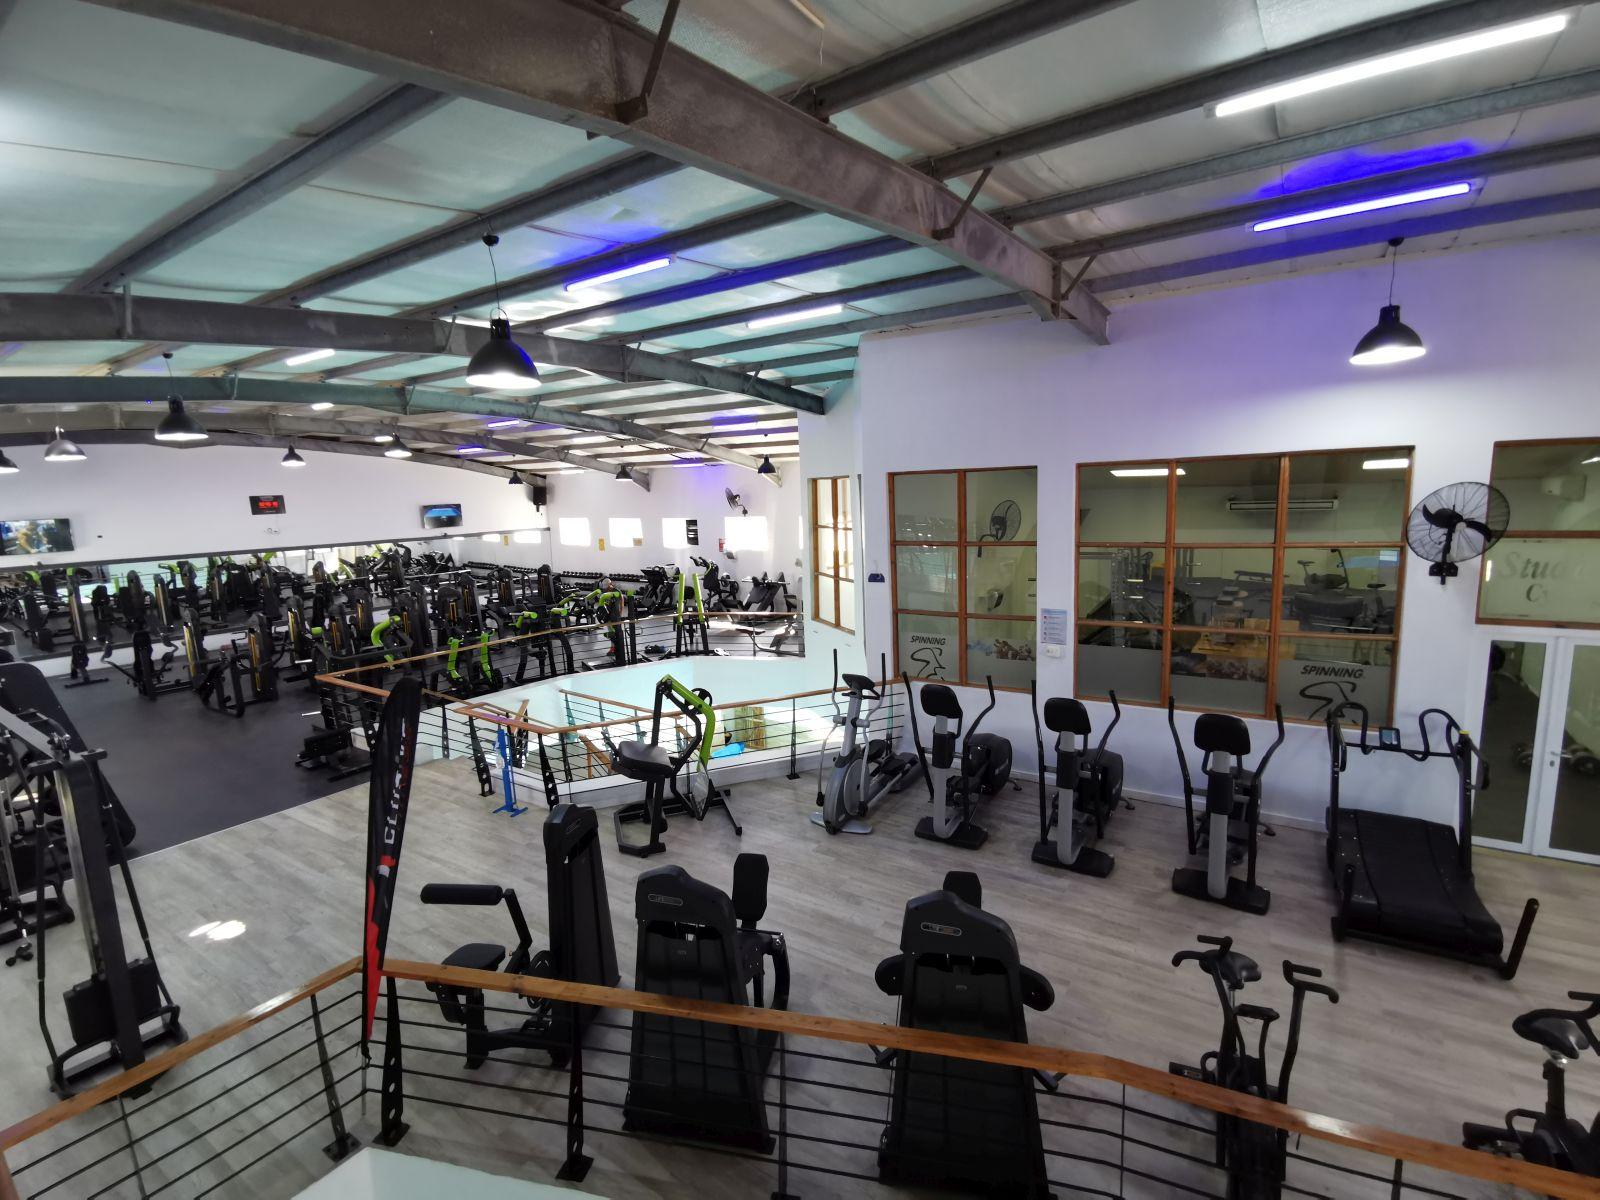 Xclusive Fitness Img 20200828 124925 1